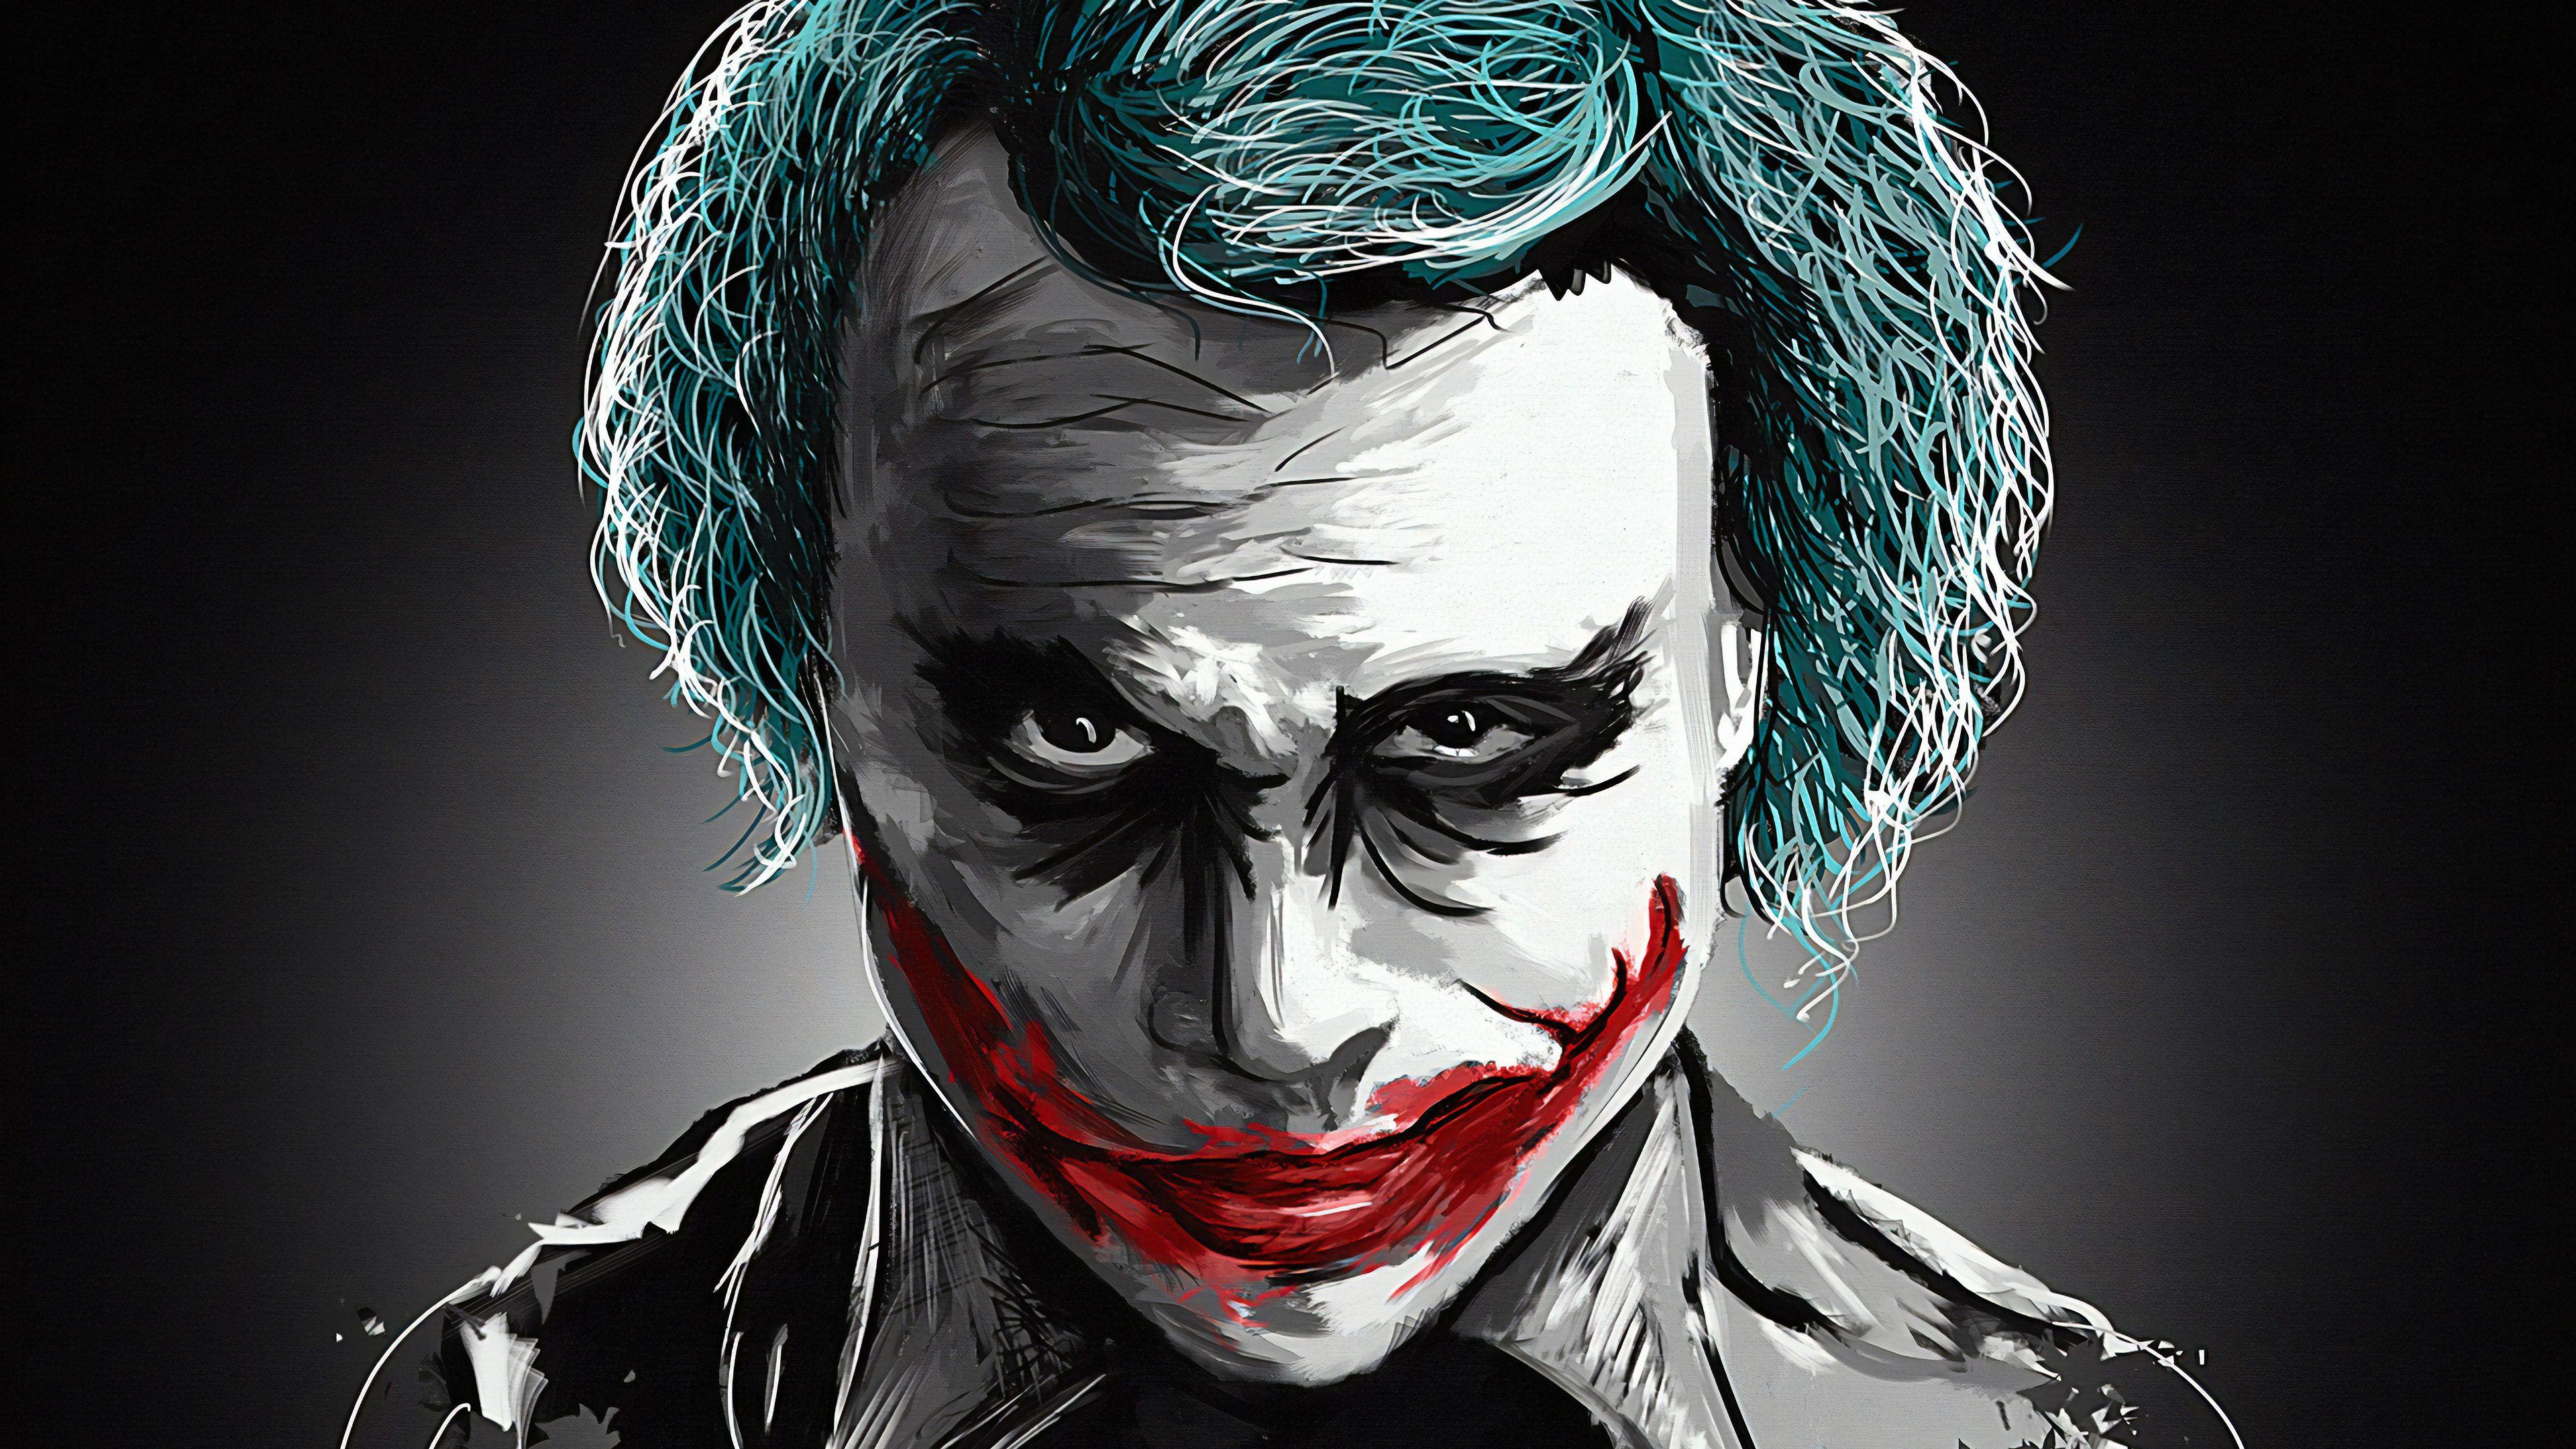 Heath Ledger HD Joker Wallpapers - Wallpaper Cave